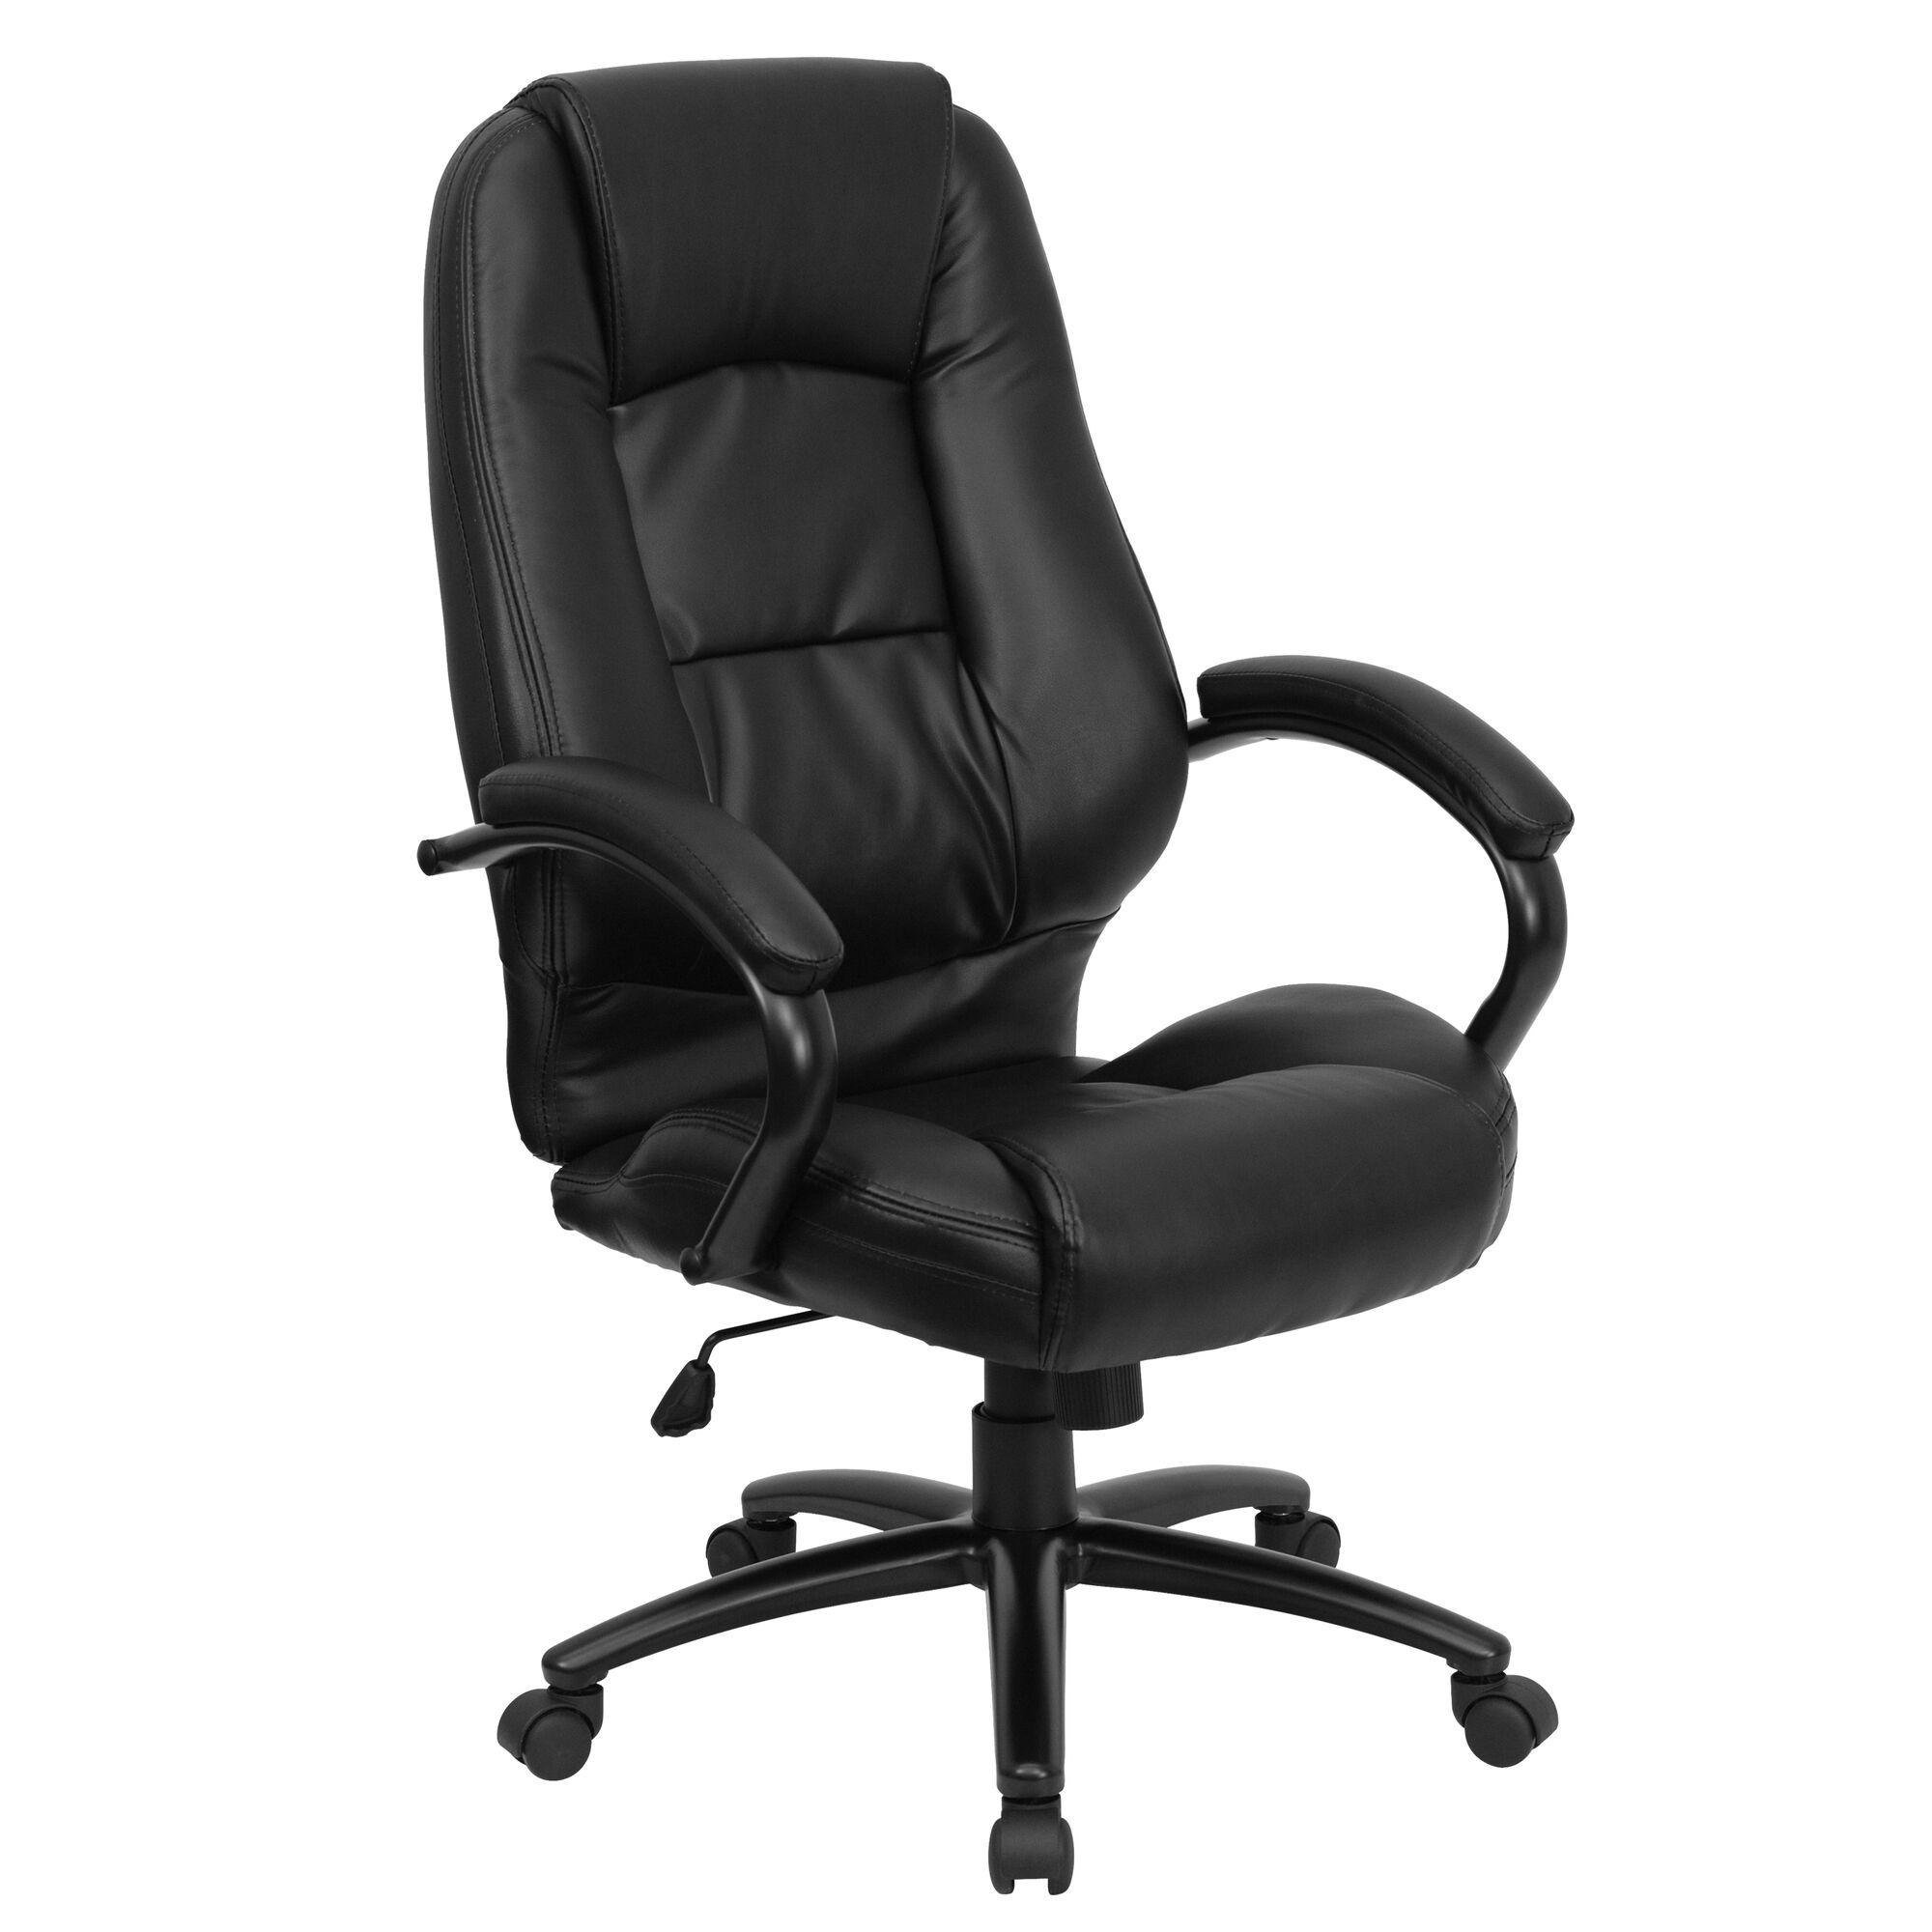 Flash Furniture GO 710 BK GG at Bizchair